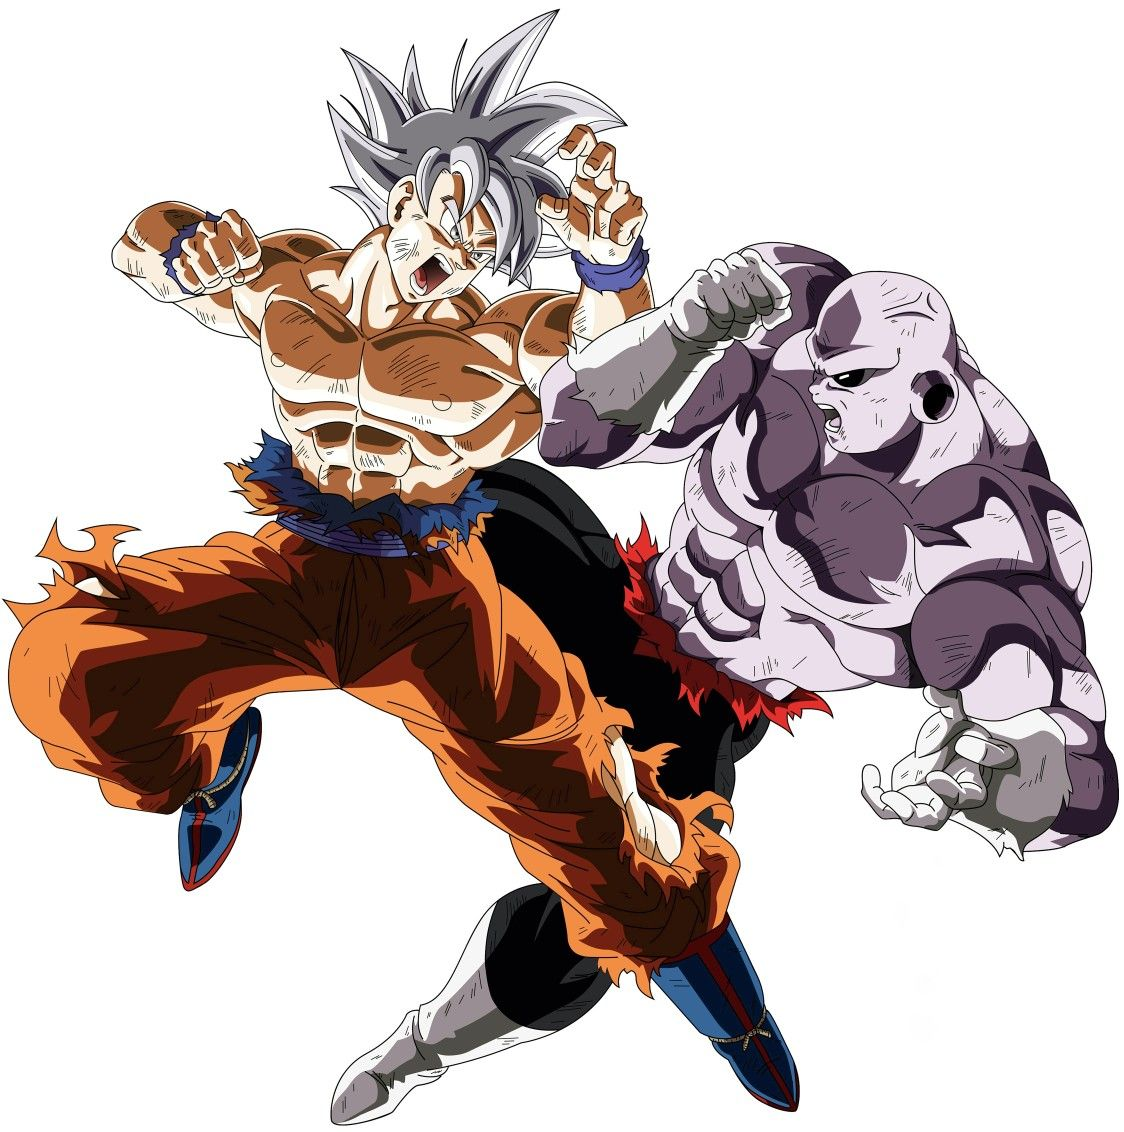 Imagenes De Goku Ultra Instinto Vs Jiren Para Dibujar